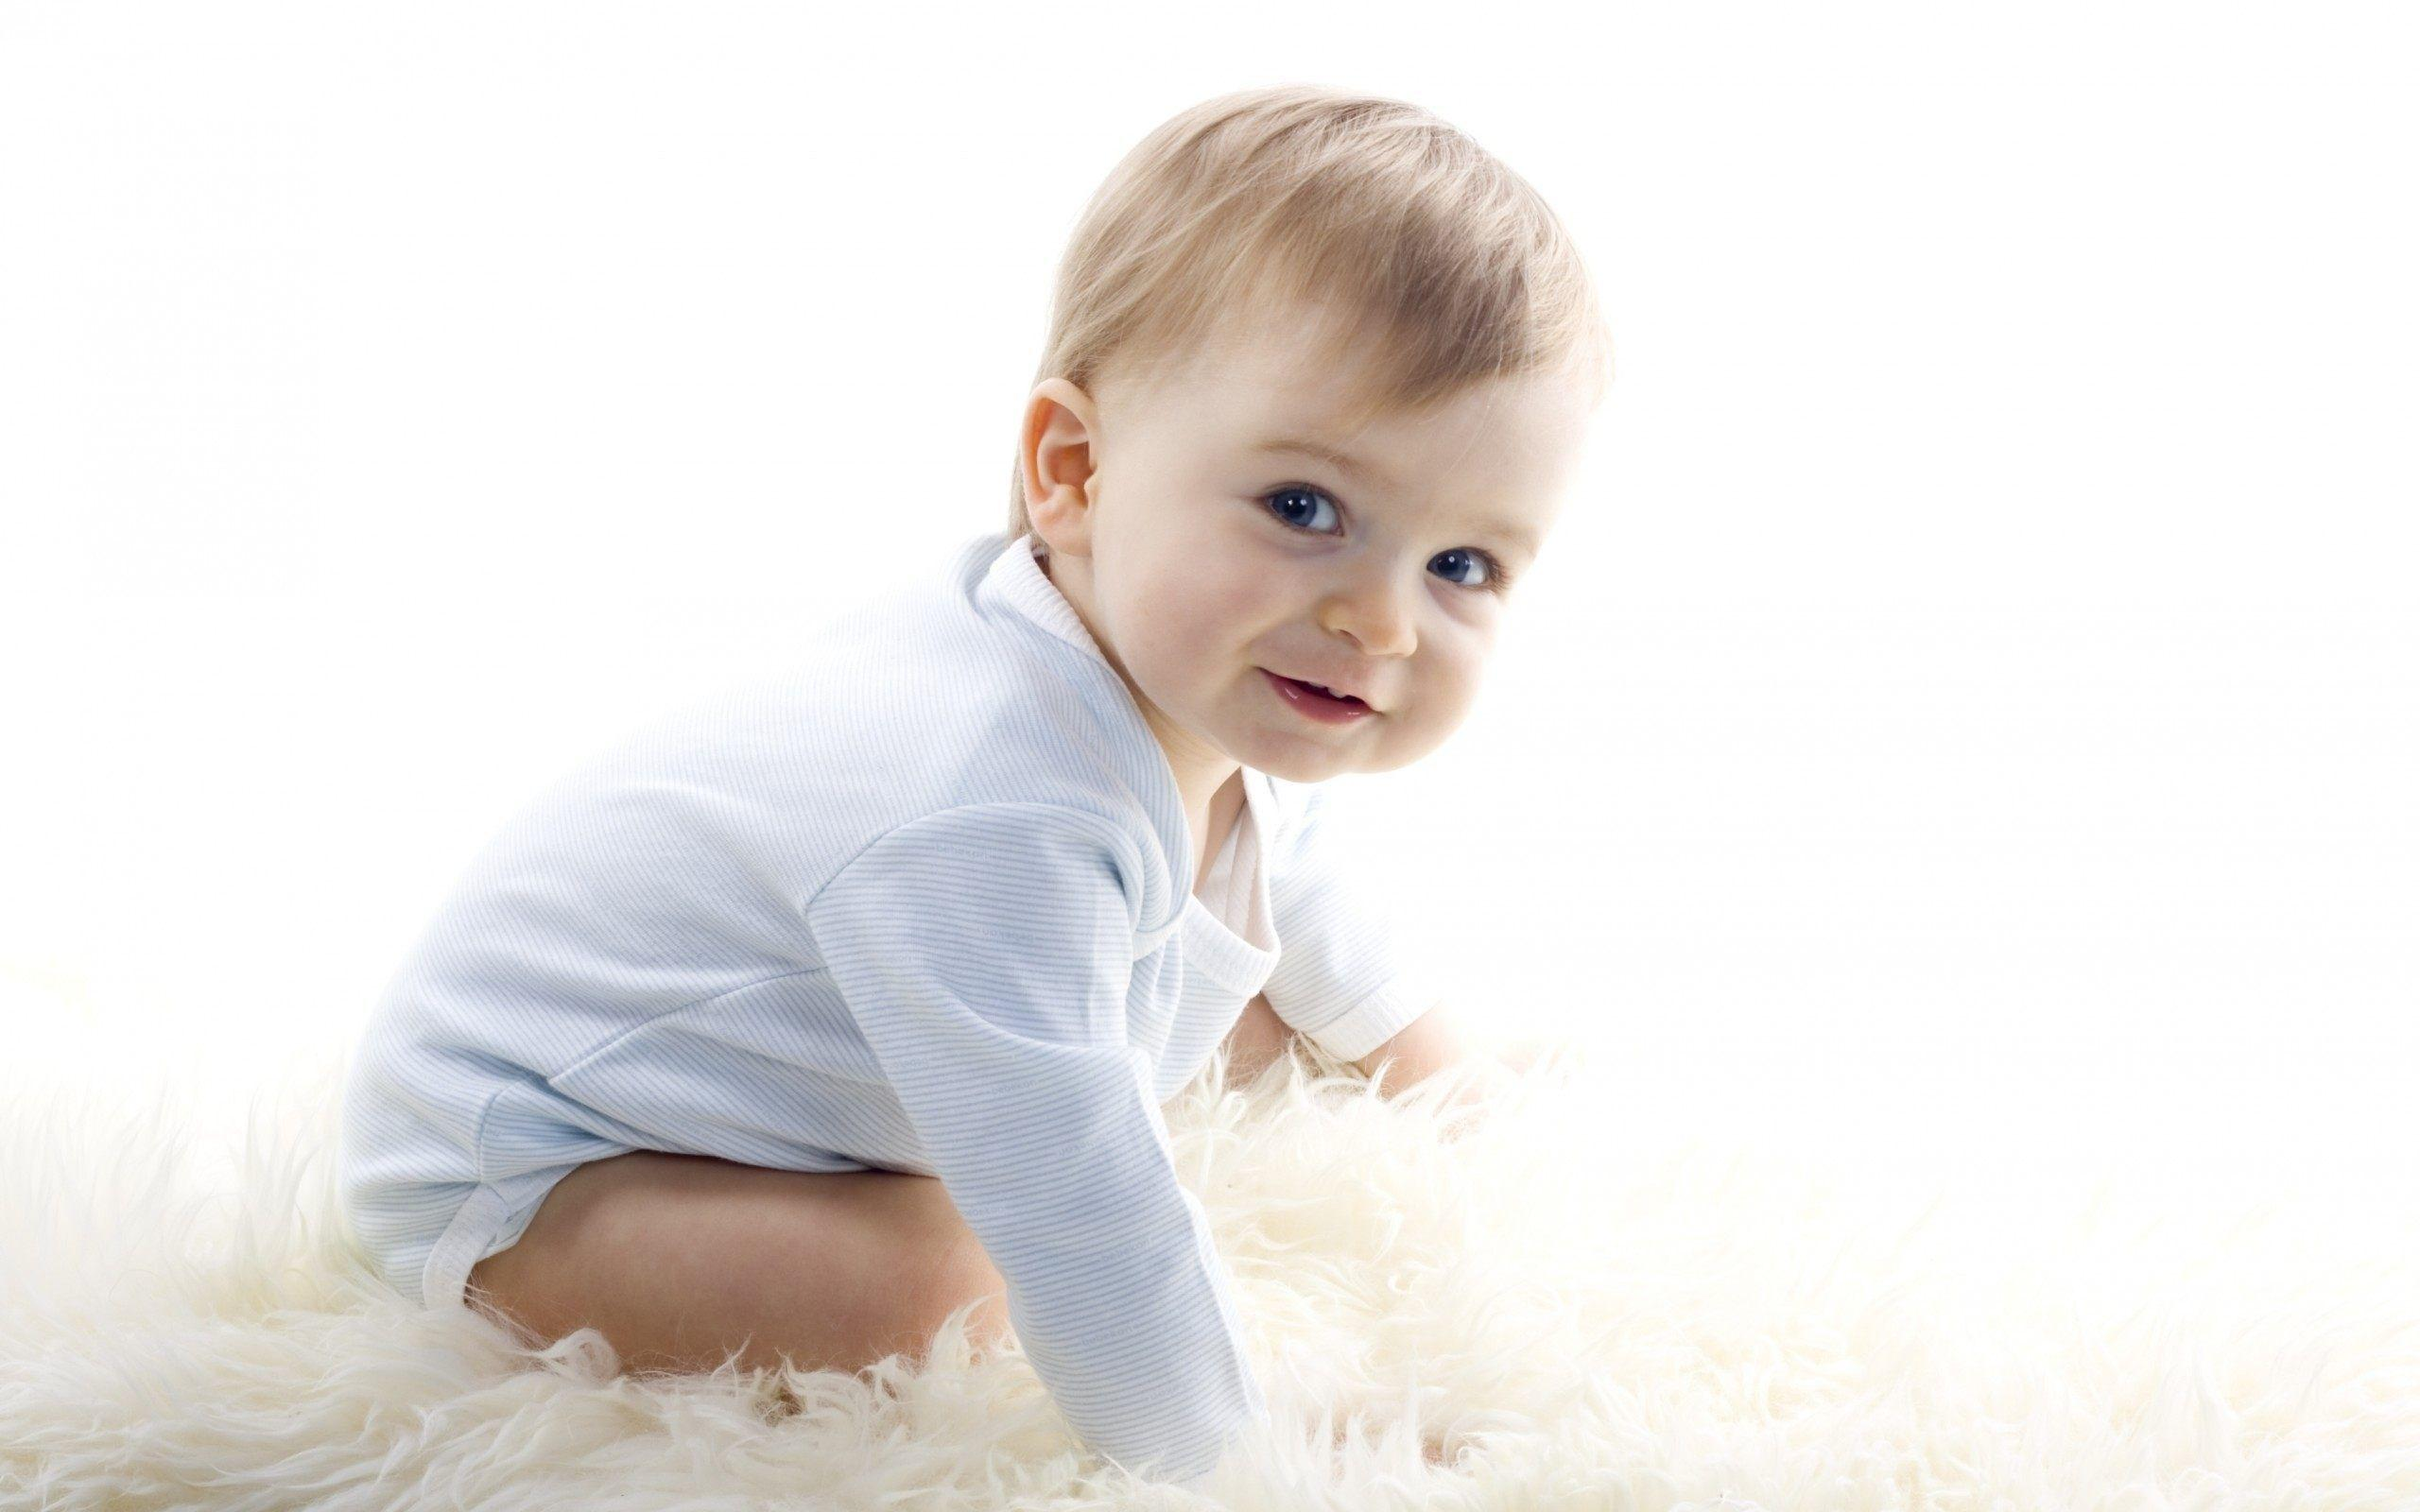 Beautiful beby wallpapers wallpaper cave - Sweet baby wallpaper free download ...